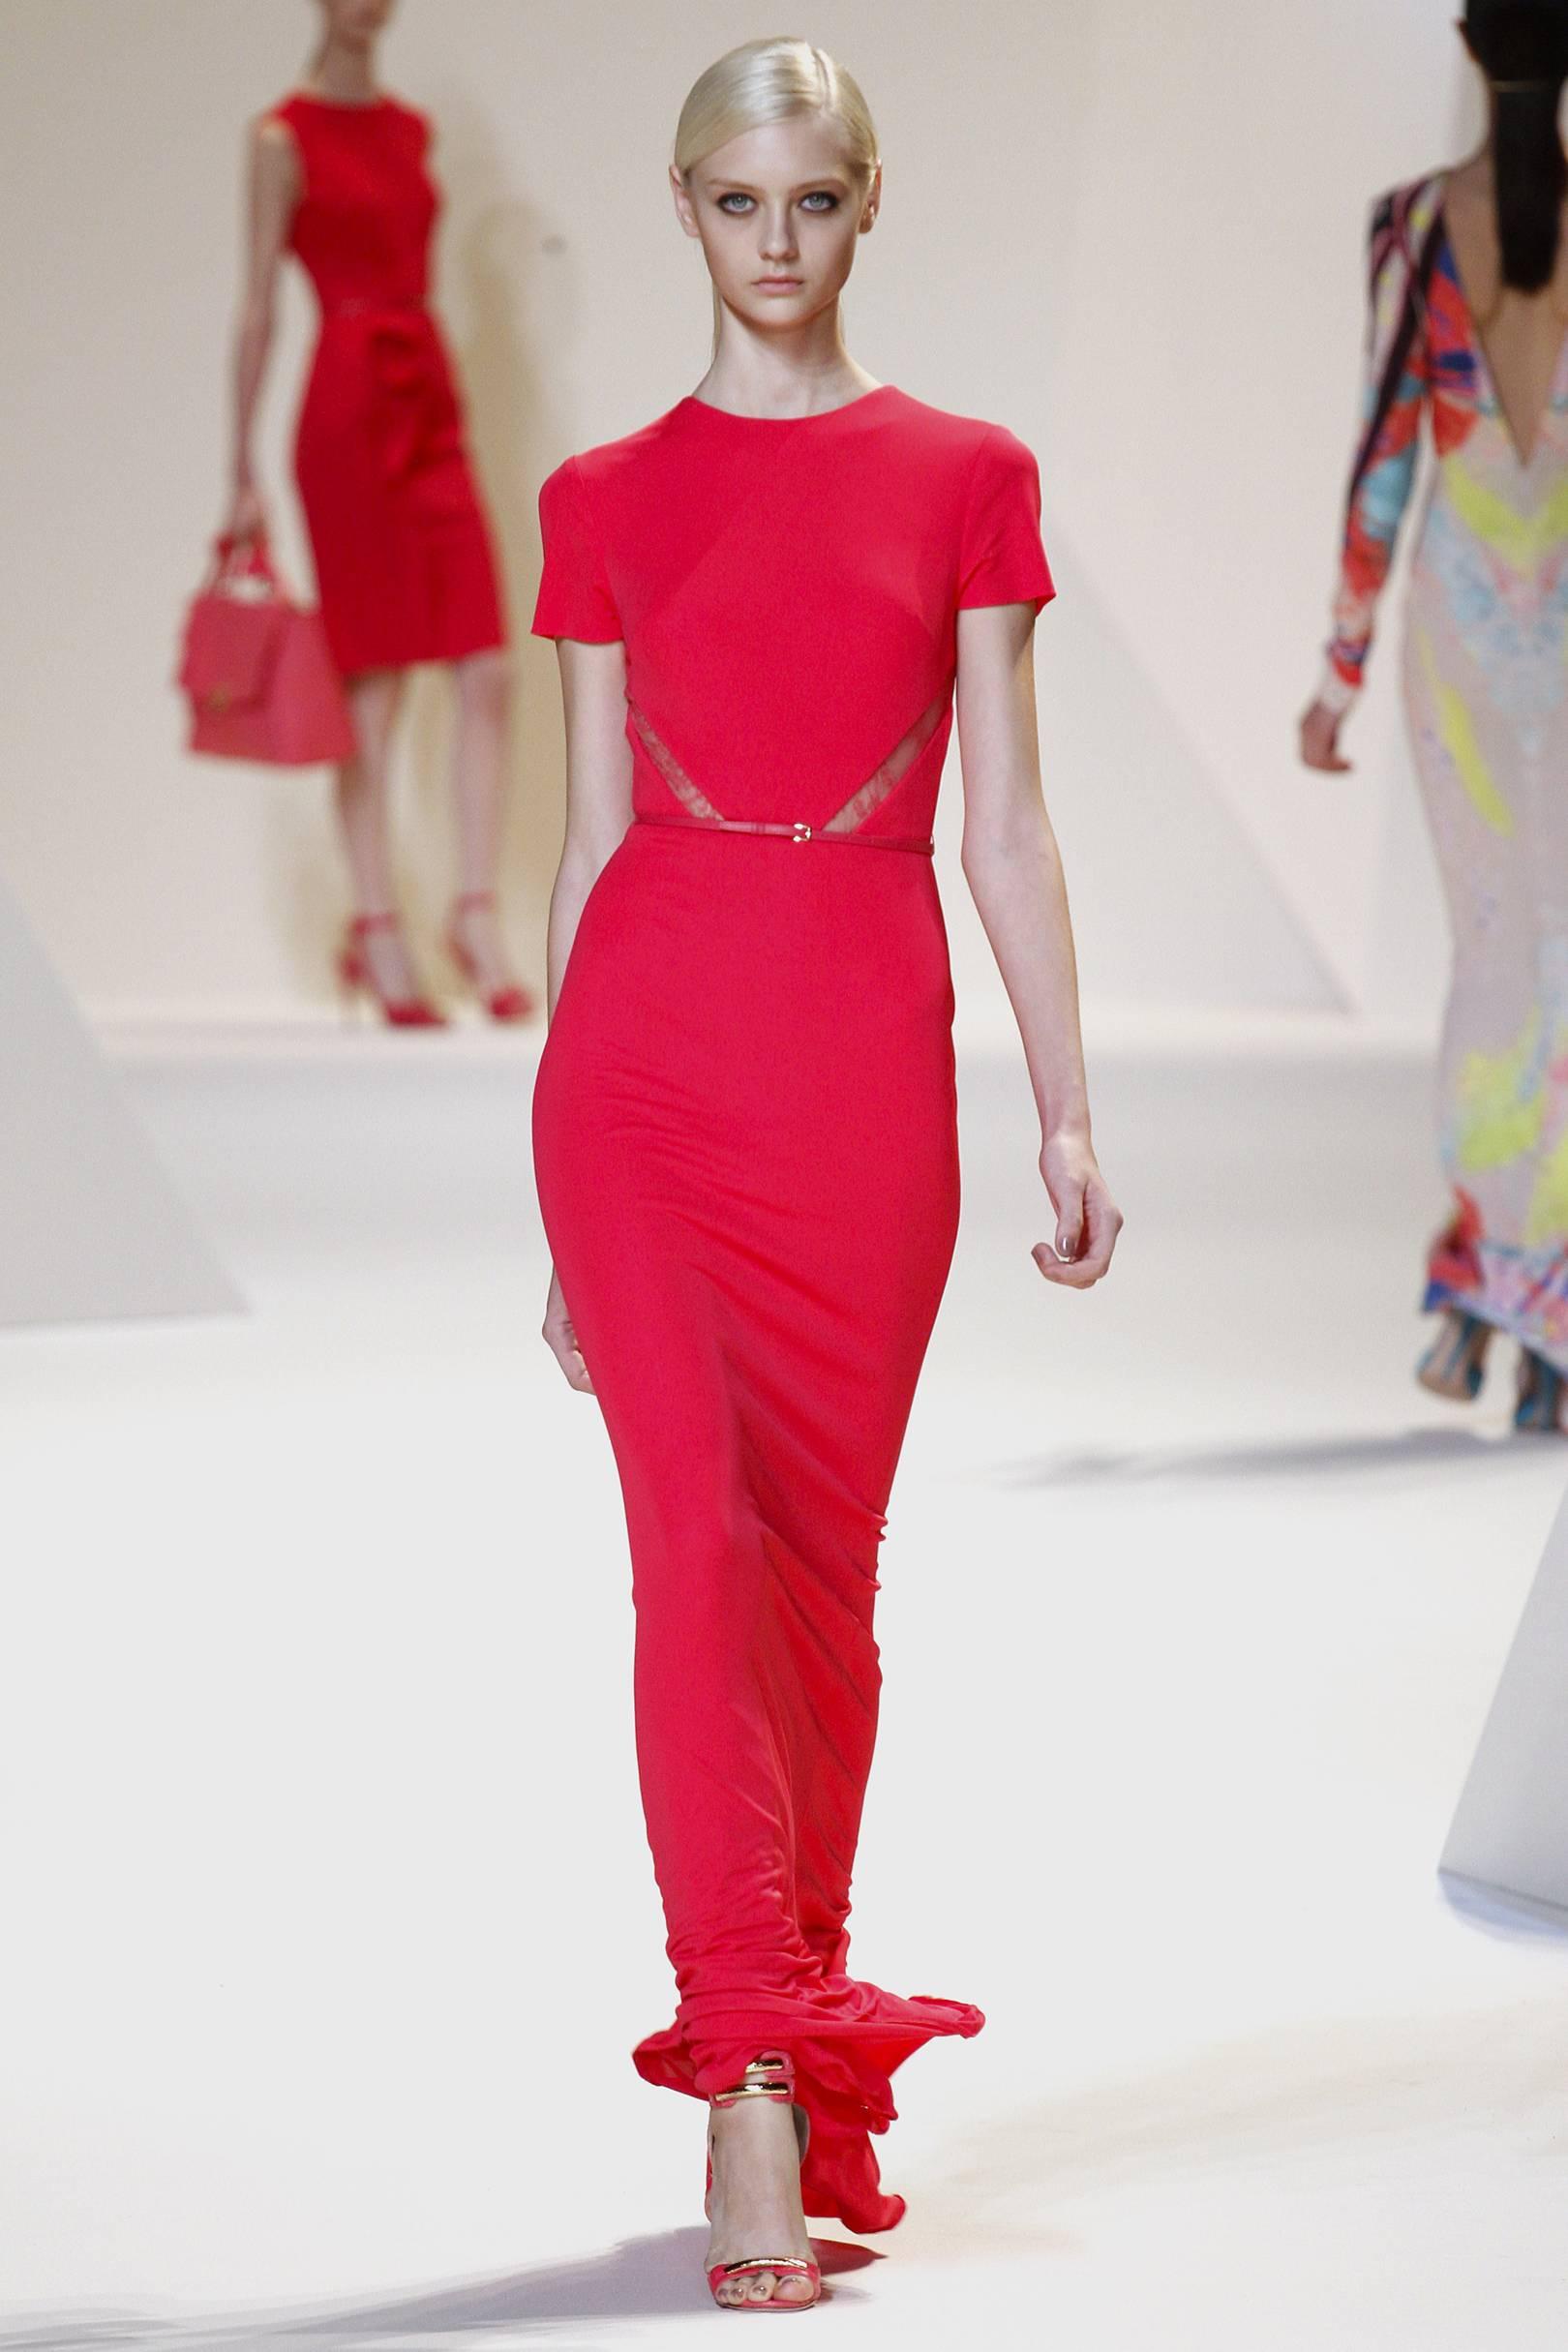 a5c8db41b6e Catwalk Dresses 2012 – Best Dresses from the Catwalk